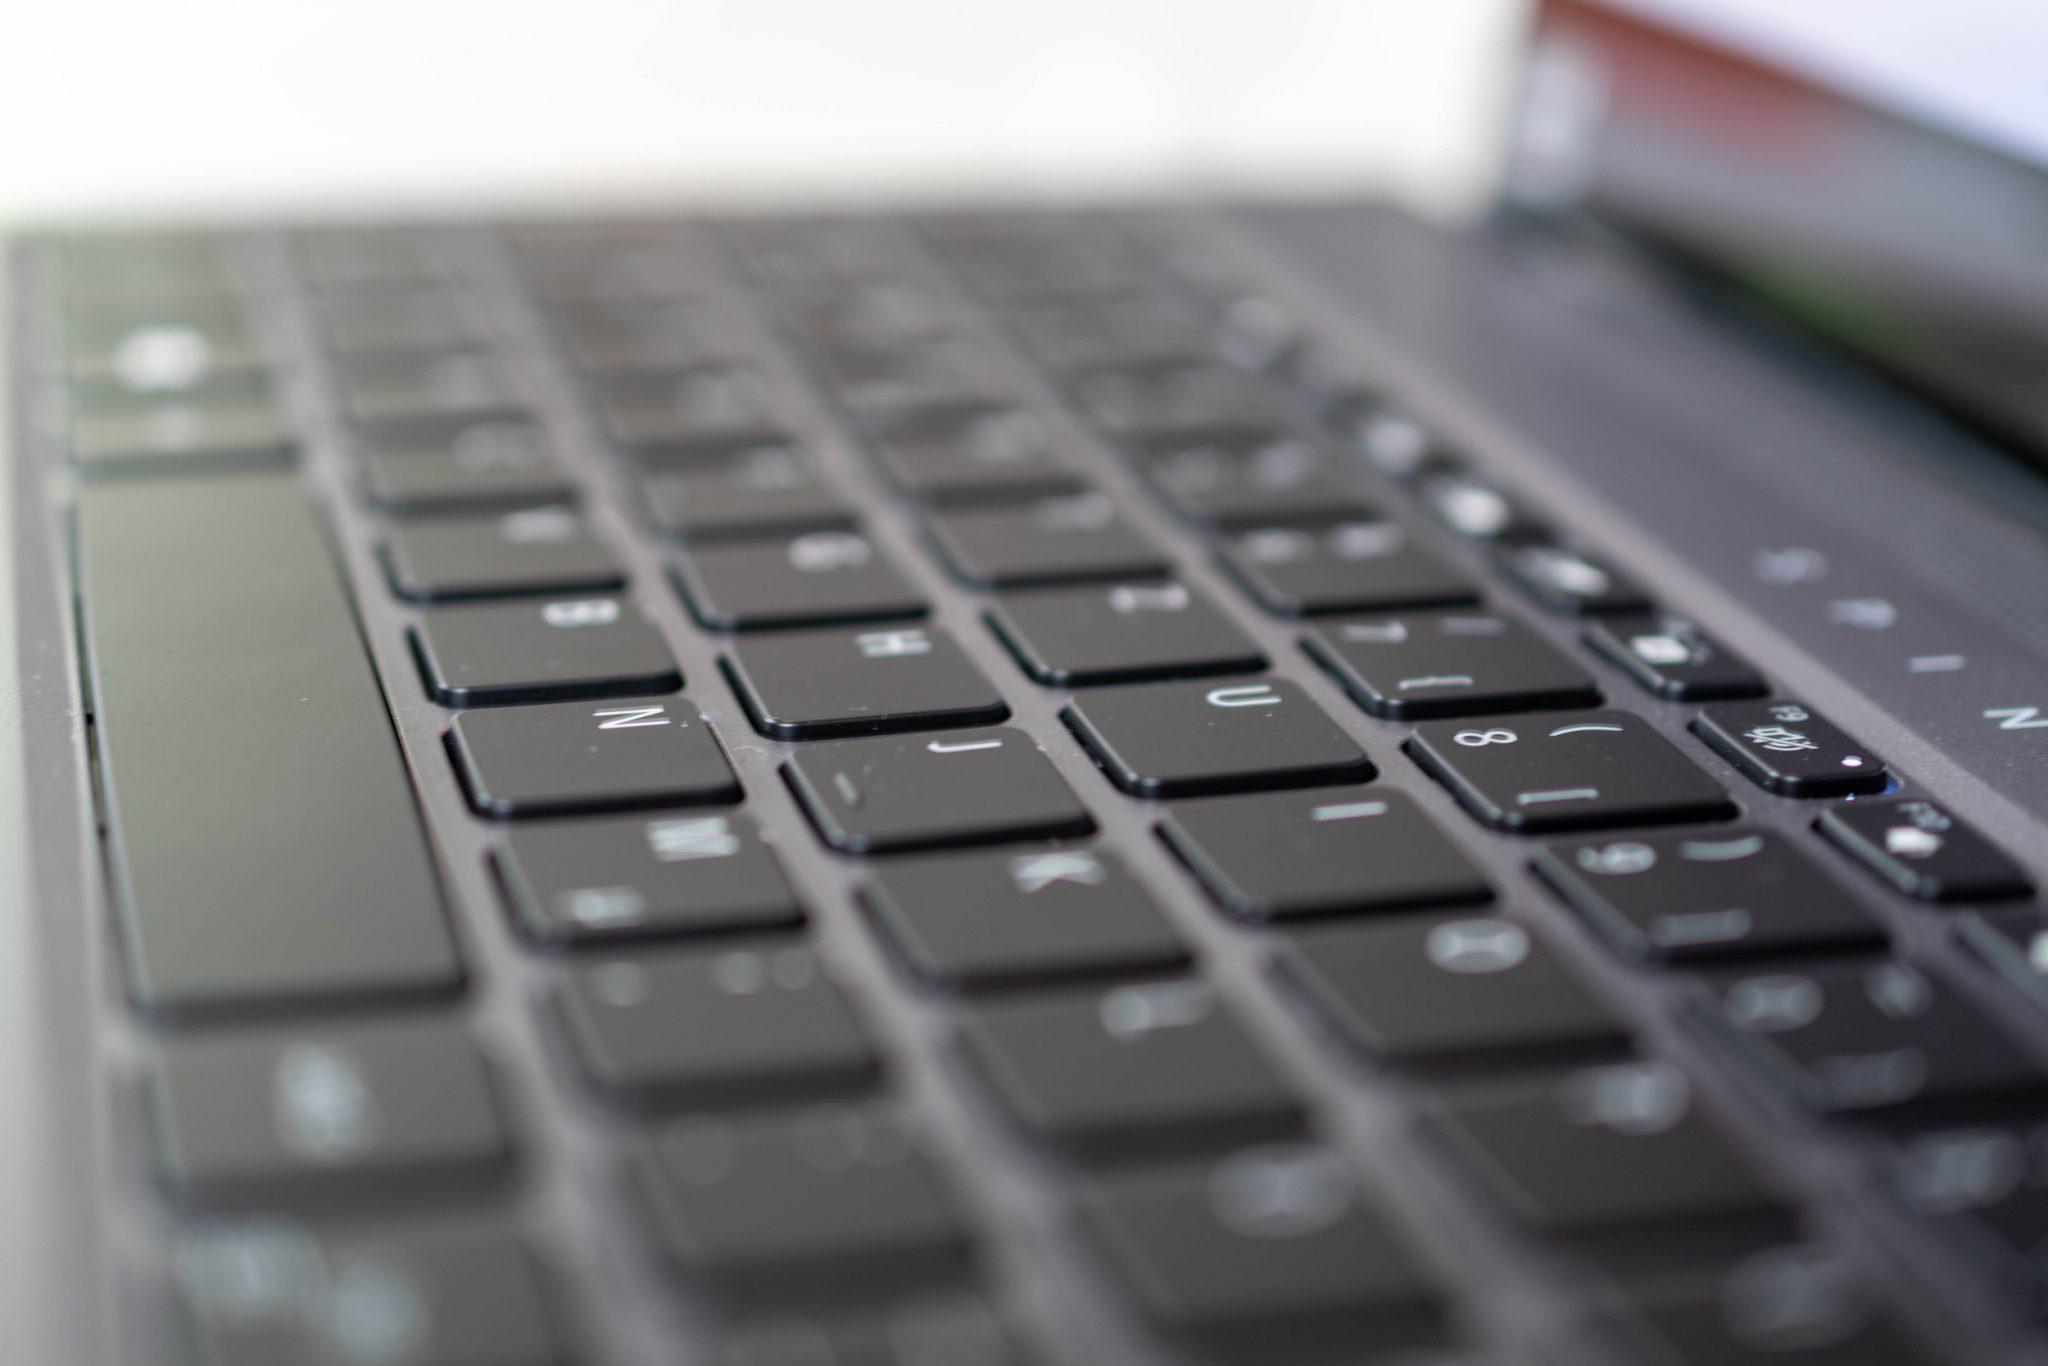 Acer Spin 5 keyboard